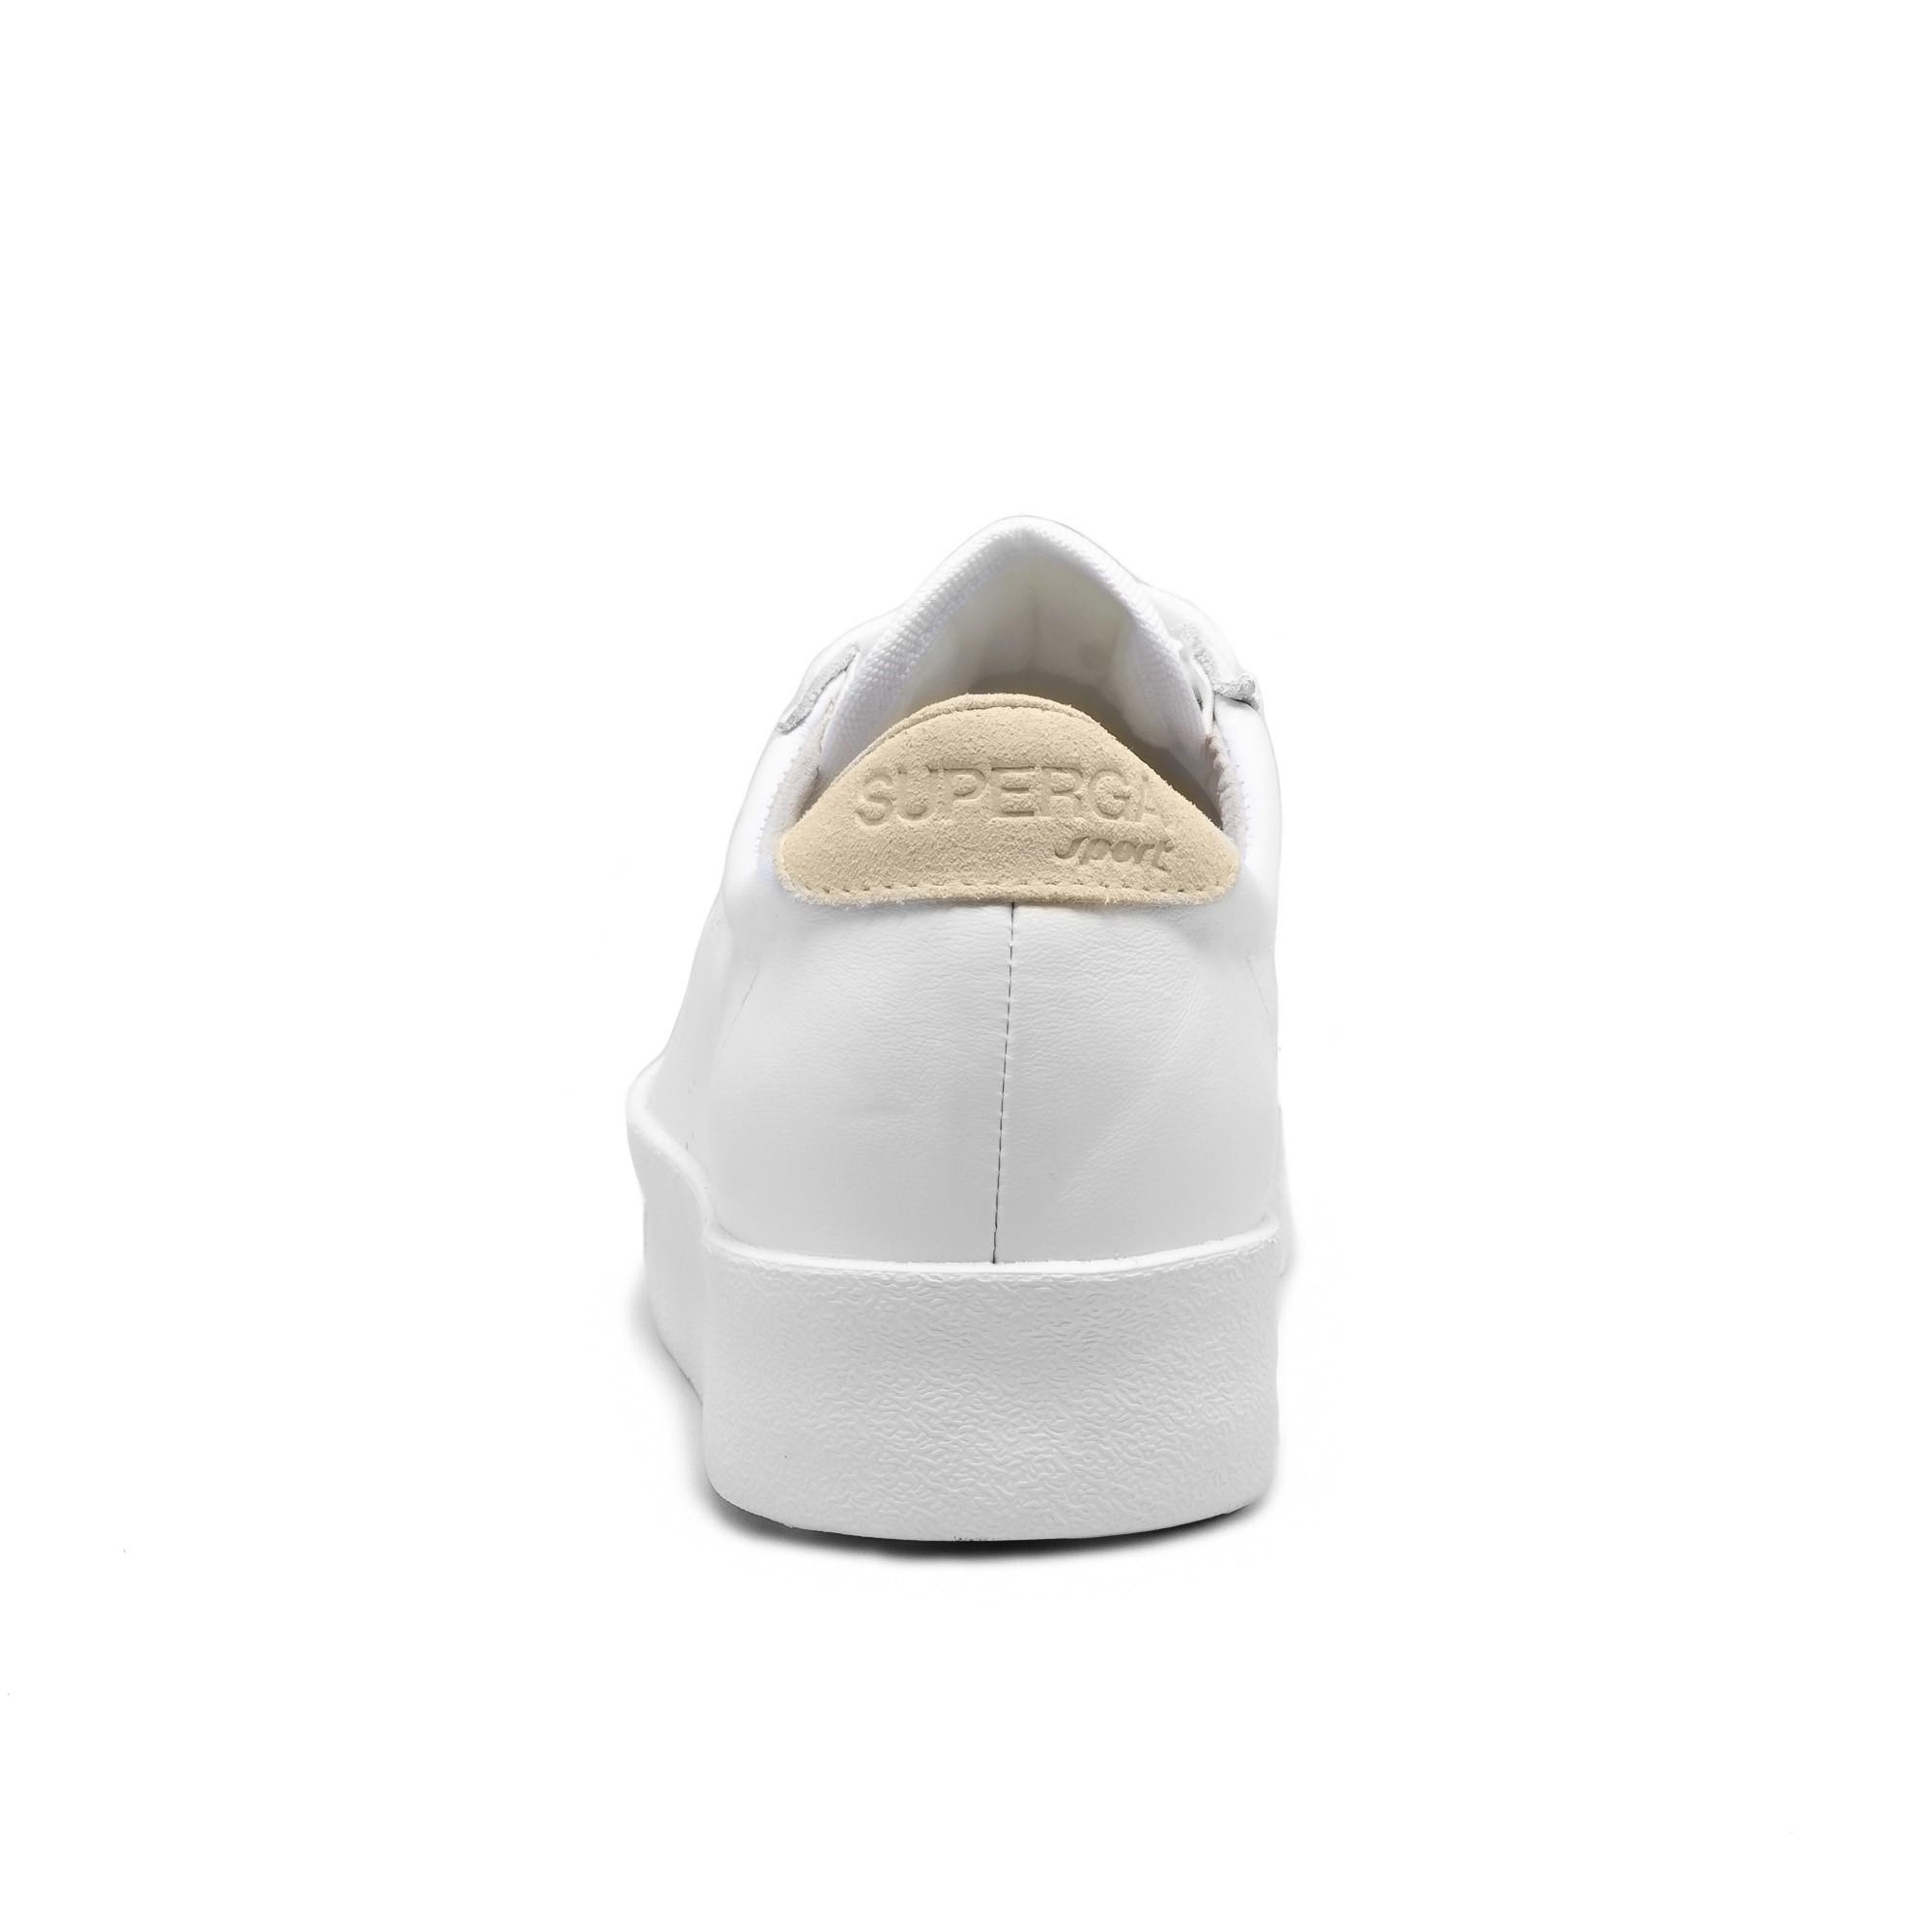 2854-CLUB 3 LEASUEW - White Beige Lt Sand